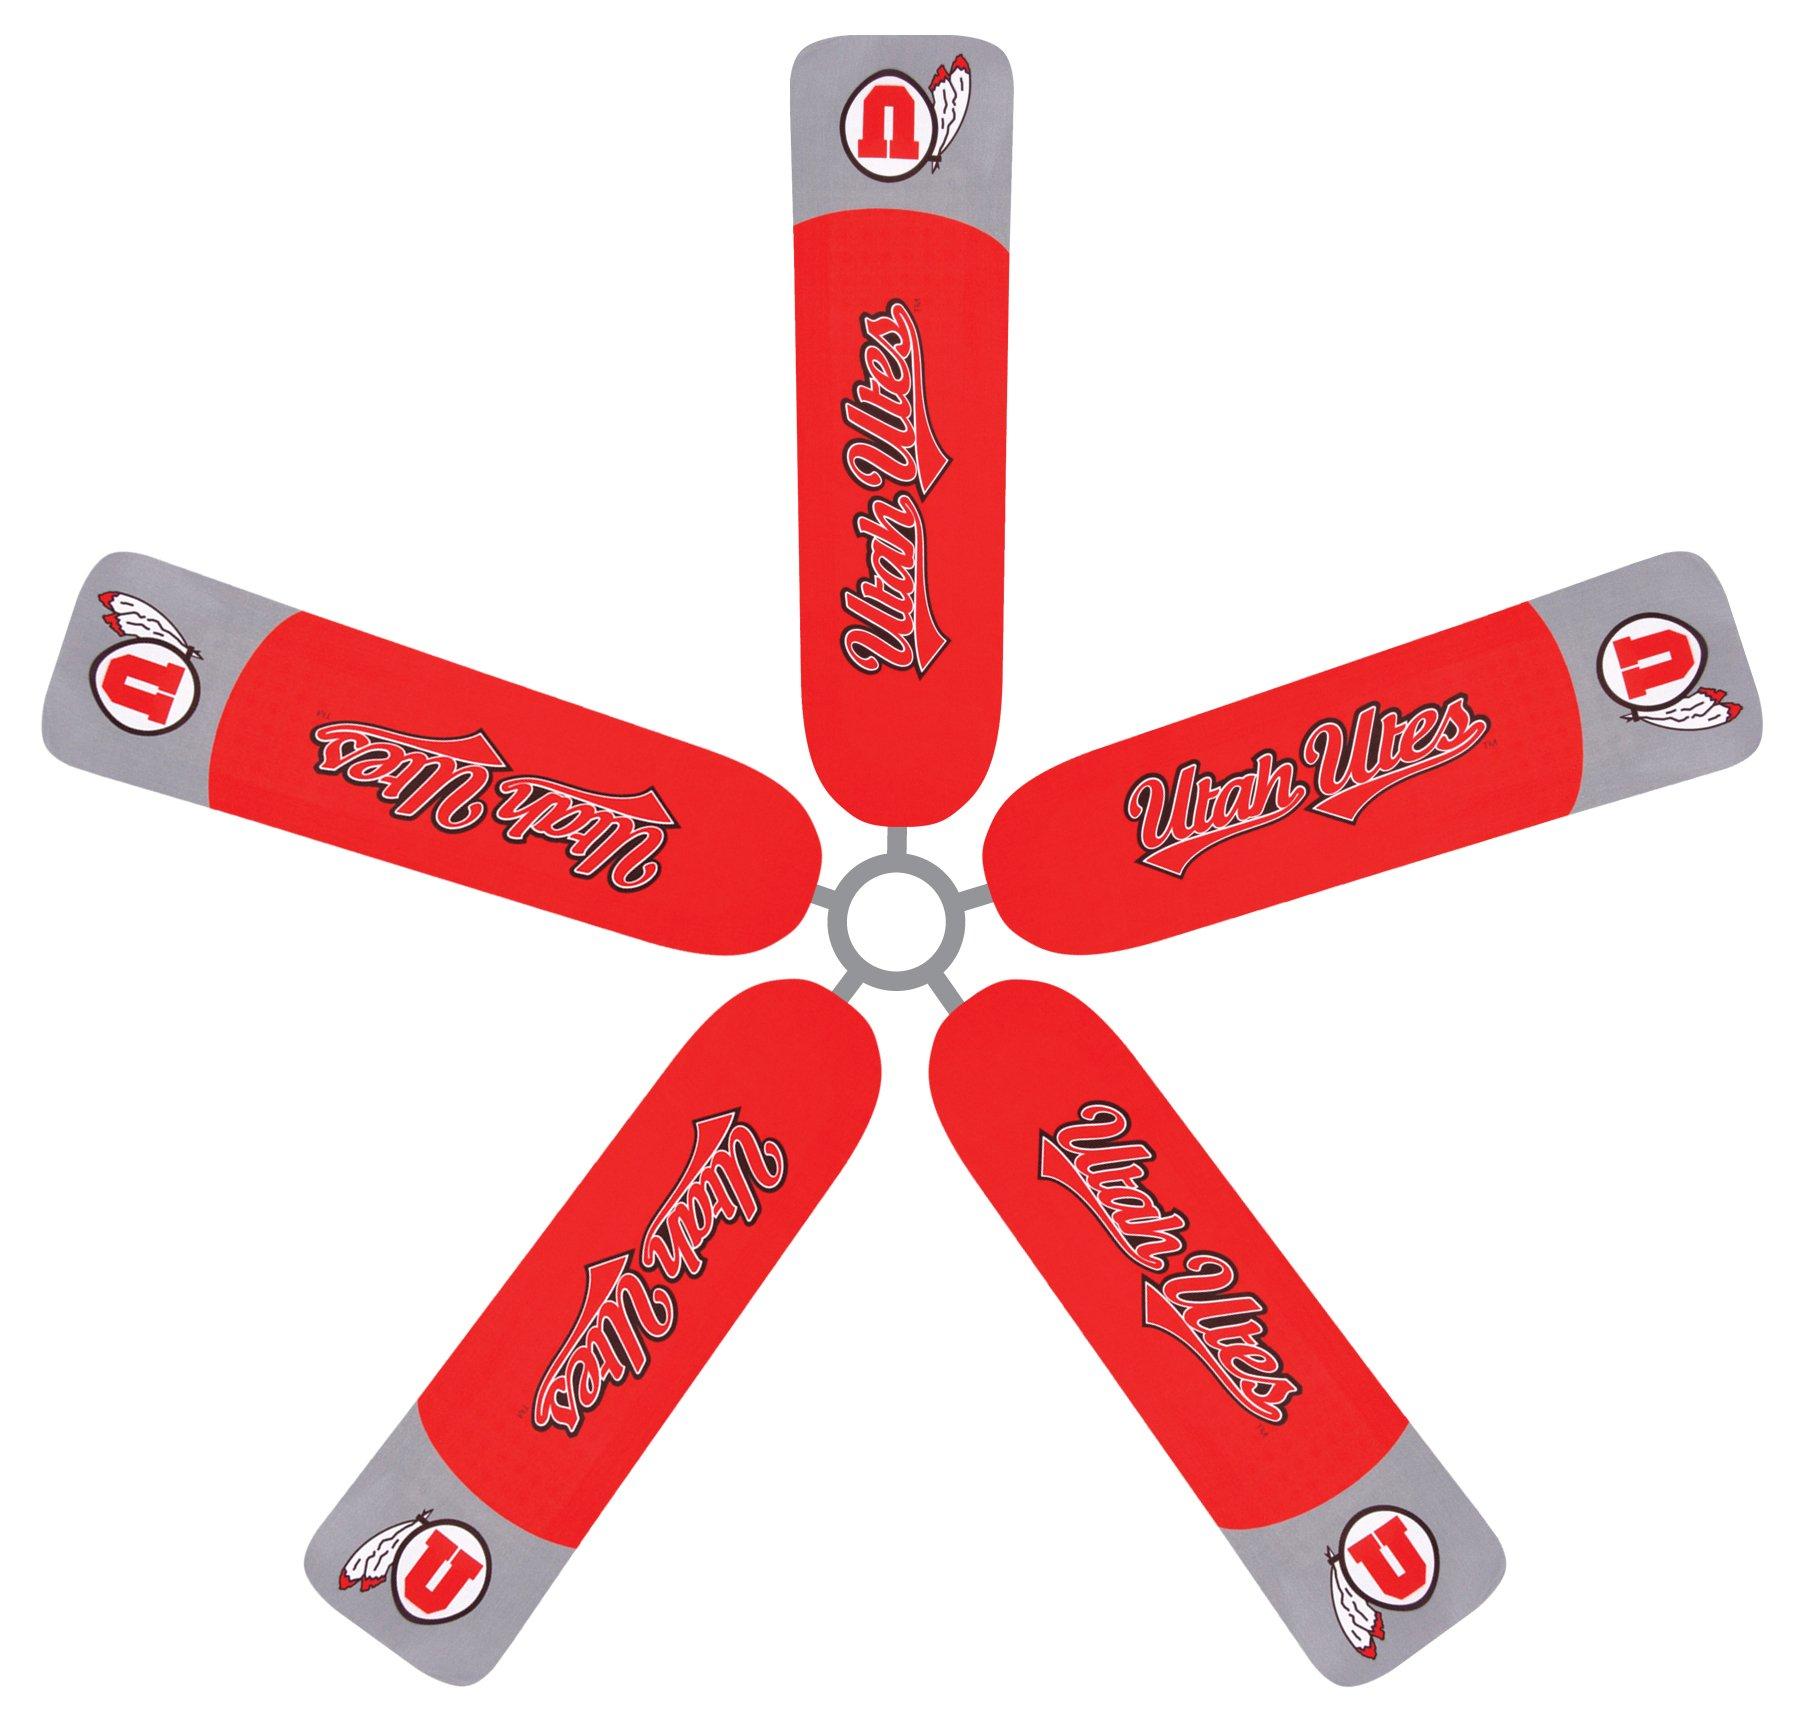 Fan Blade Designs University of Utah Utes Ceiling Fan Blade Covers